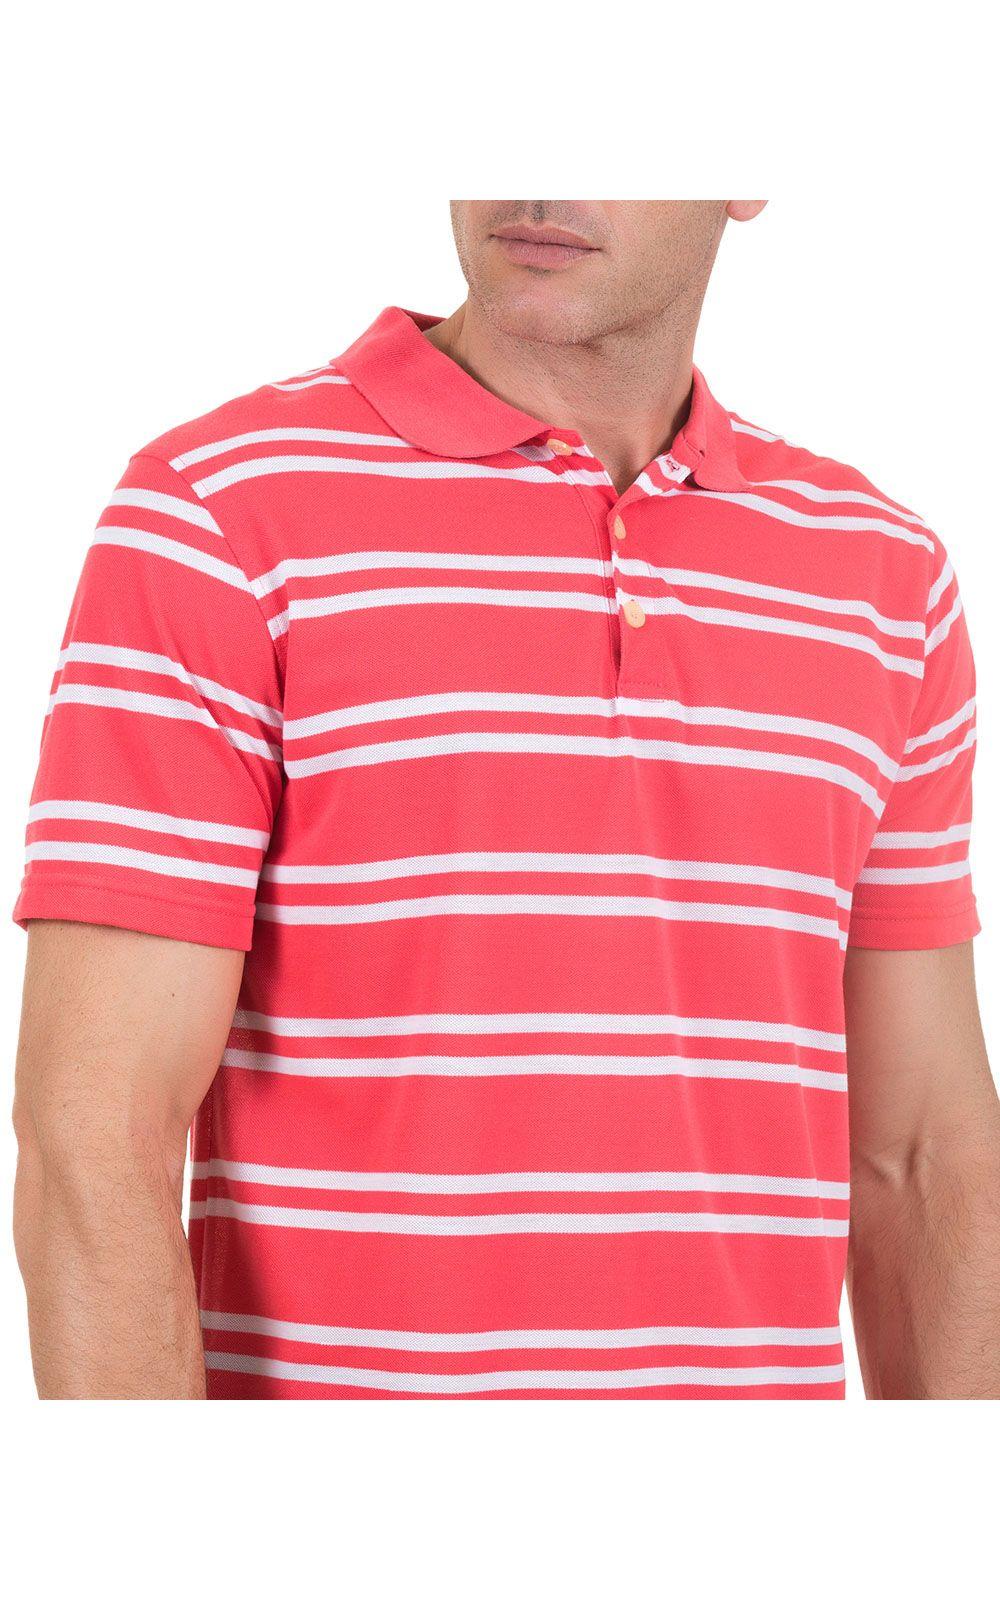 Foto 3 - Camisa Polo Masculina Rosa Listrada